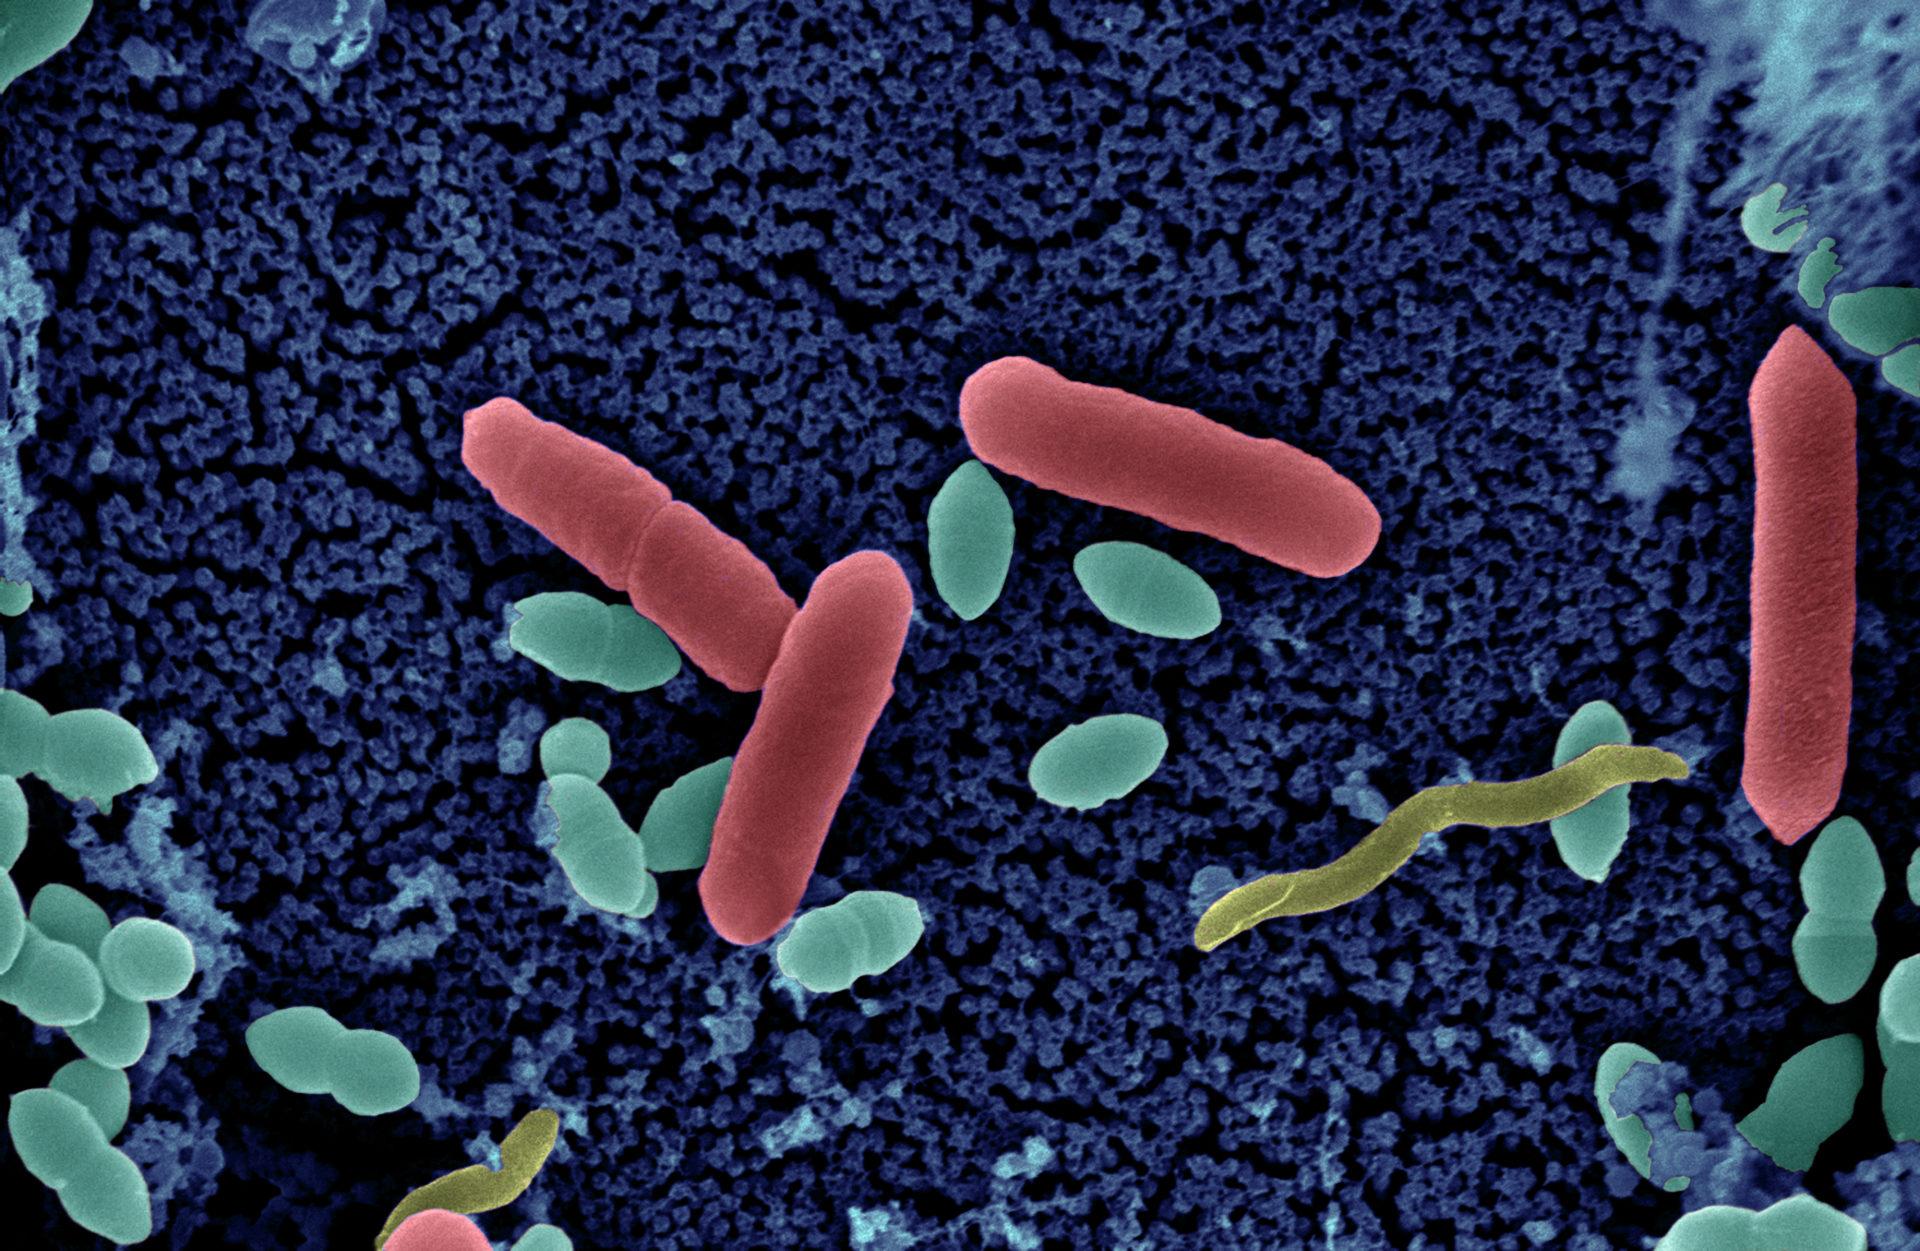 schistosomiasis 76 ország